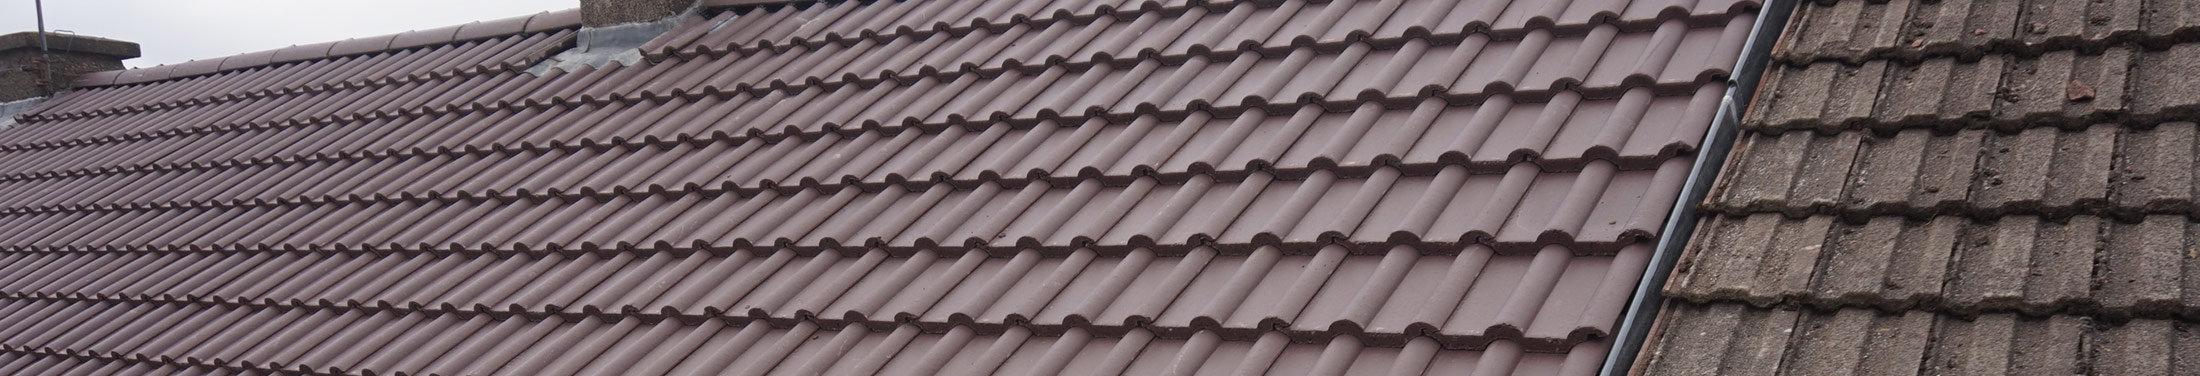 Roofers Clarkston